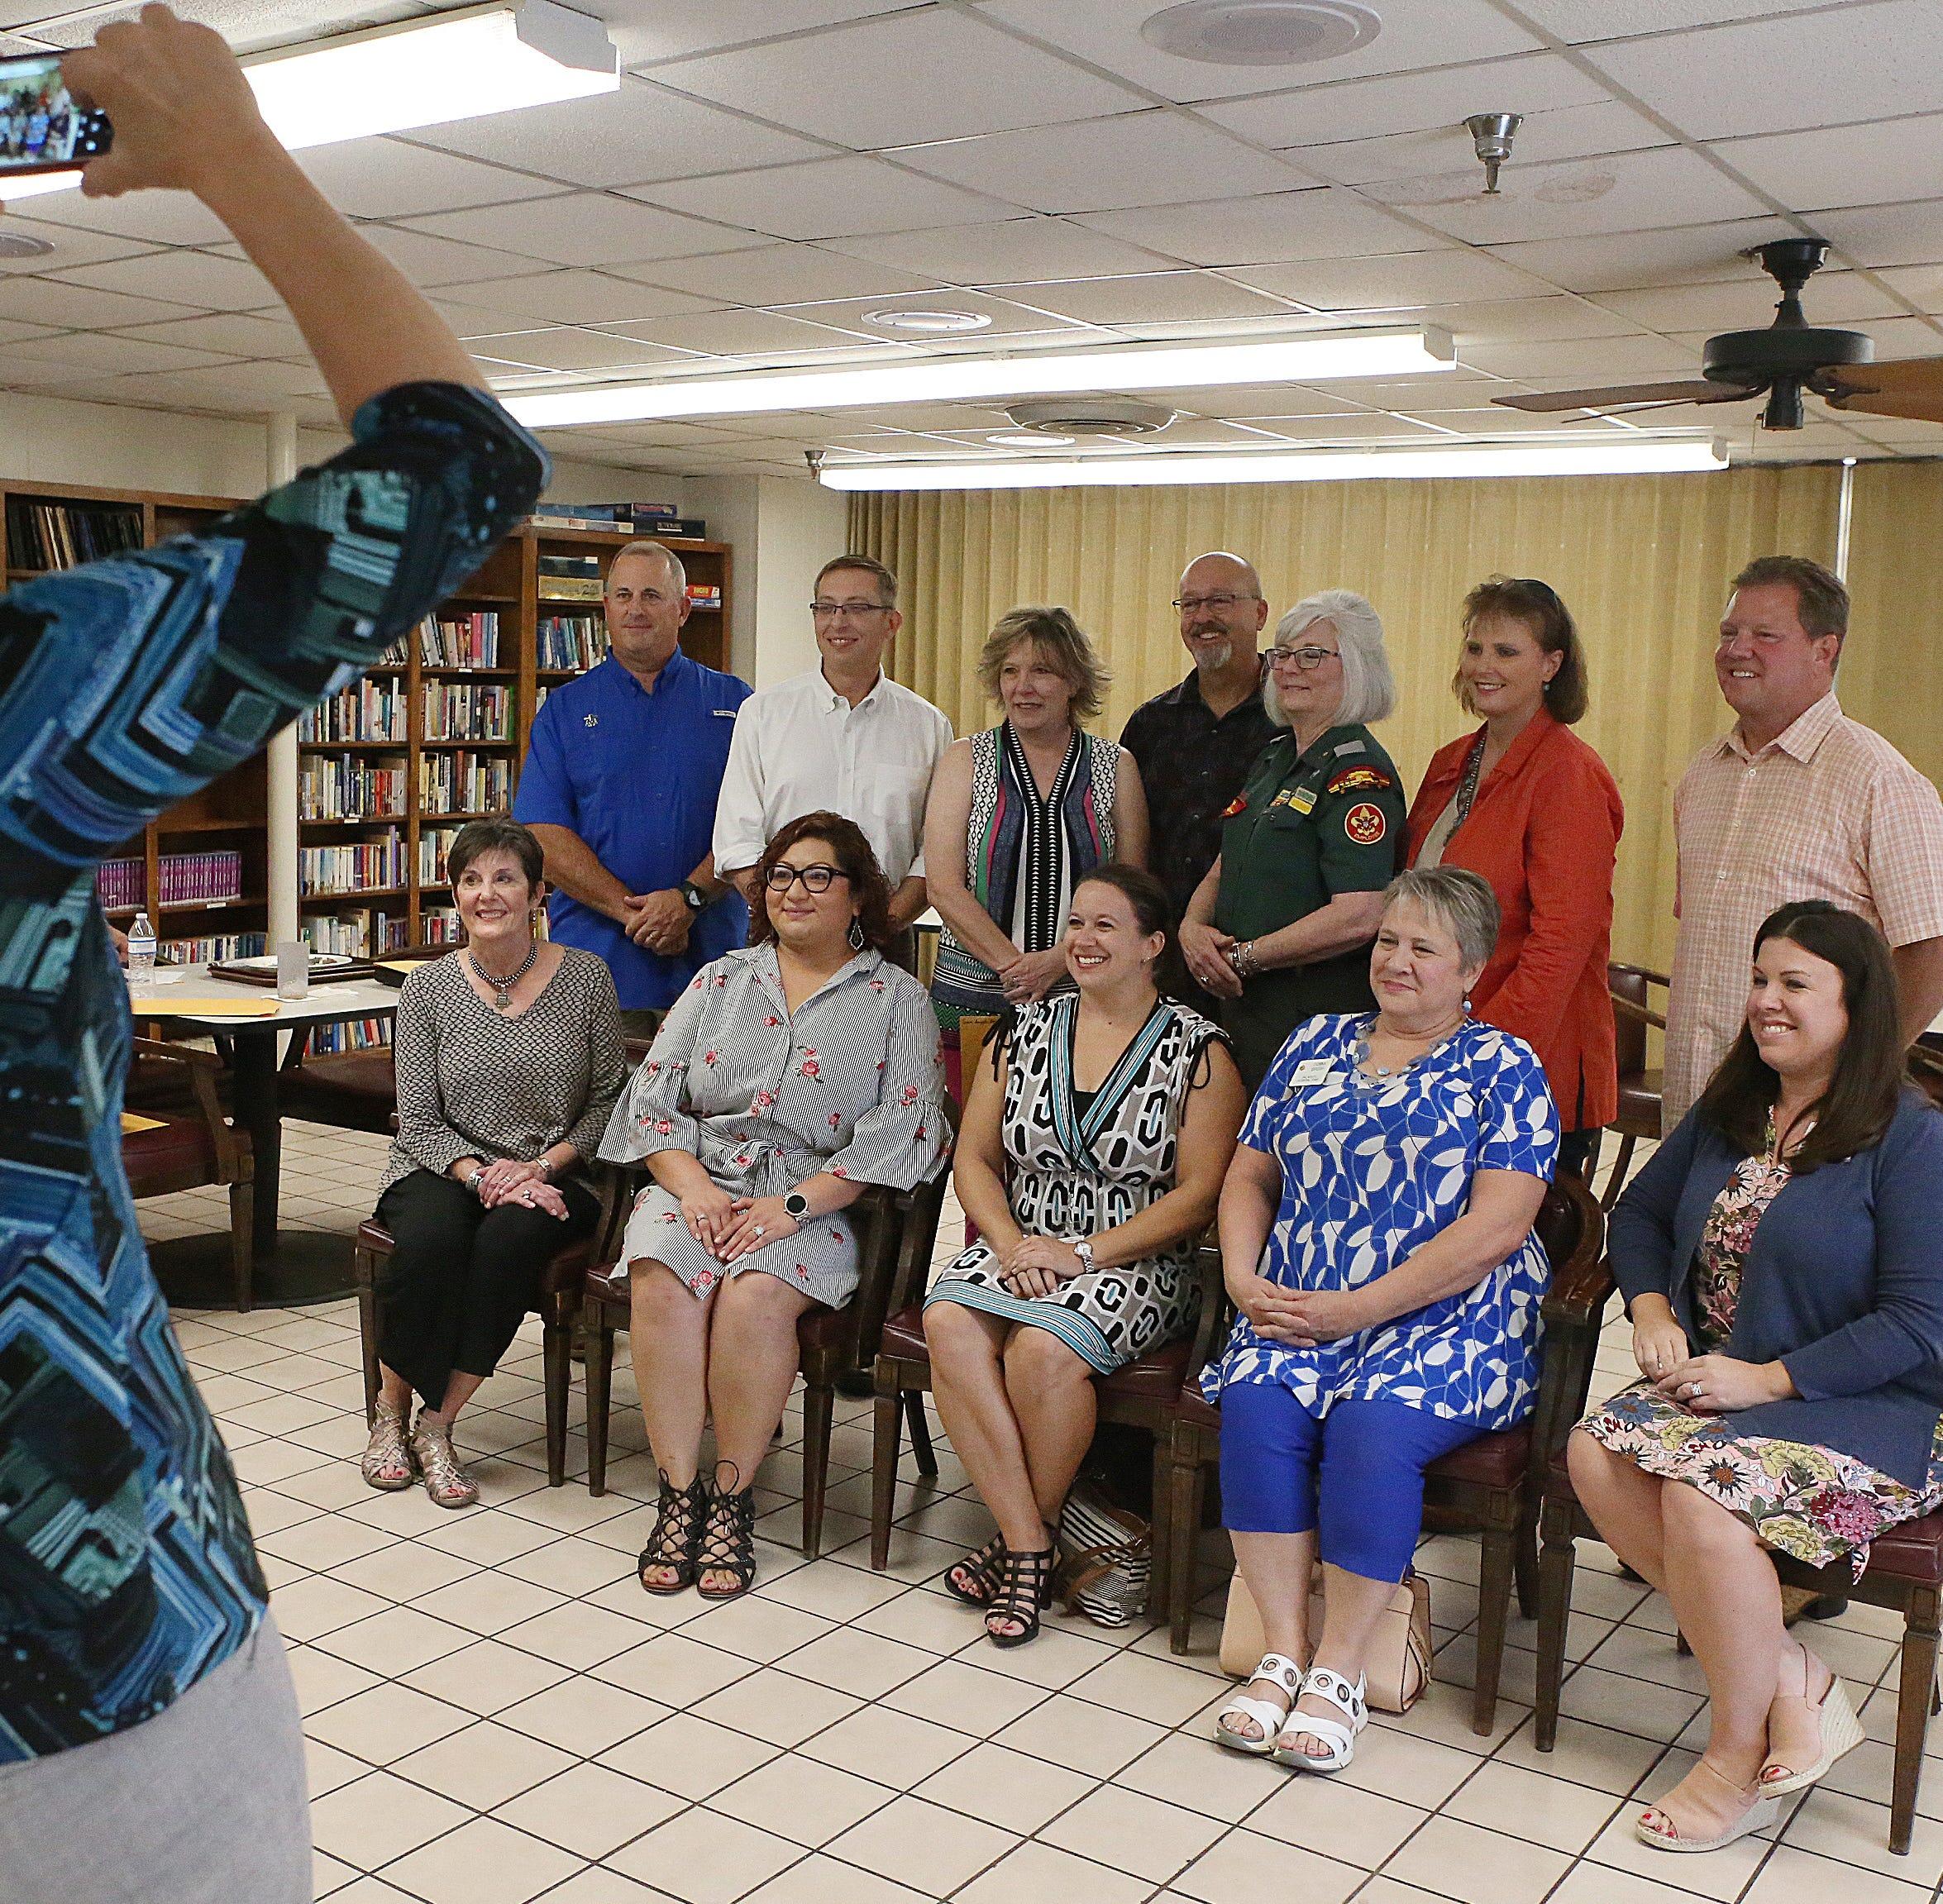 San Angelo Kiwanis Club awards 12 organizations with $9,200 in grants